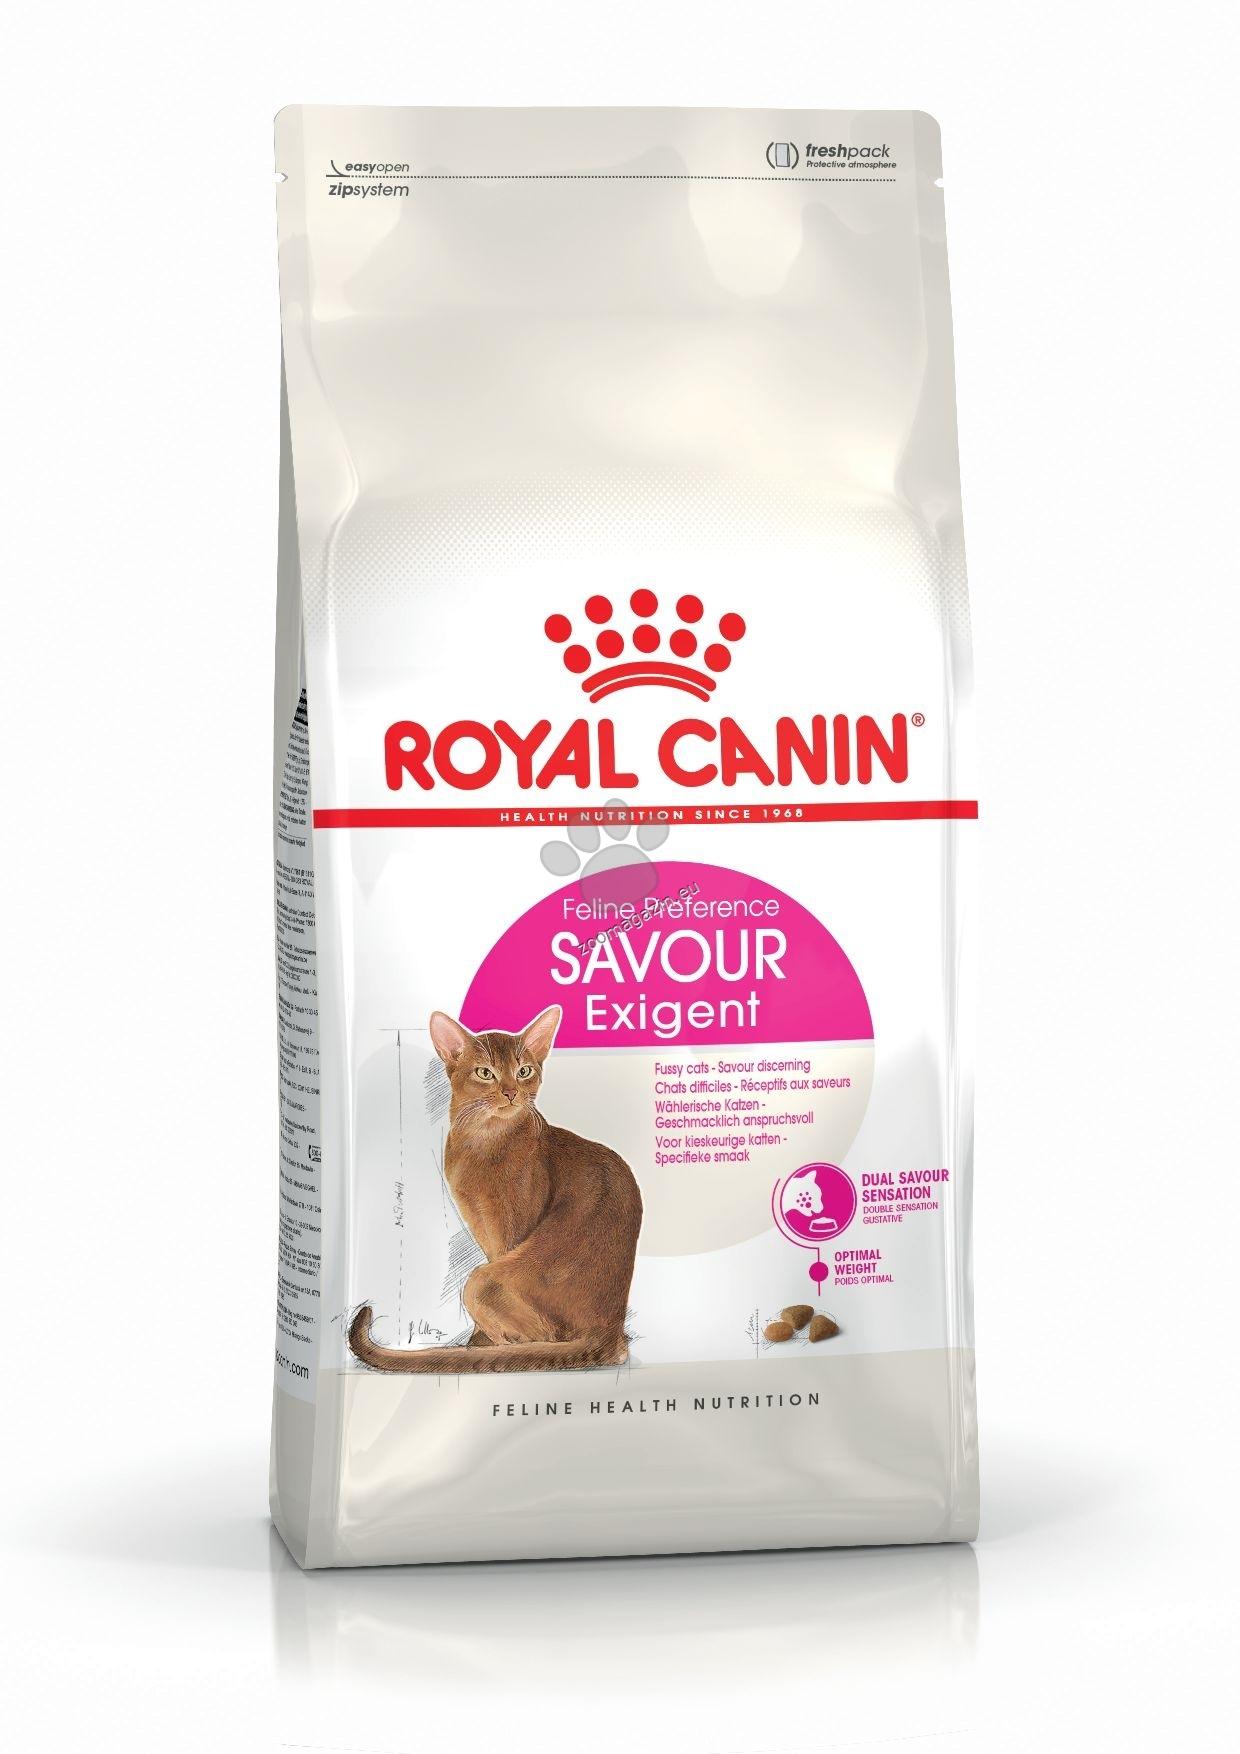 Royal Canin Exigent Savour - за много капризни котки  4 кг.